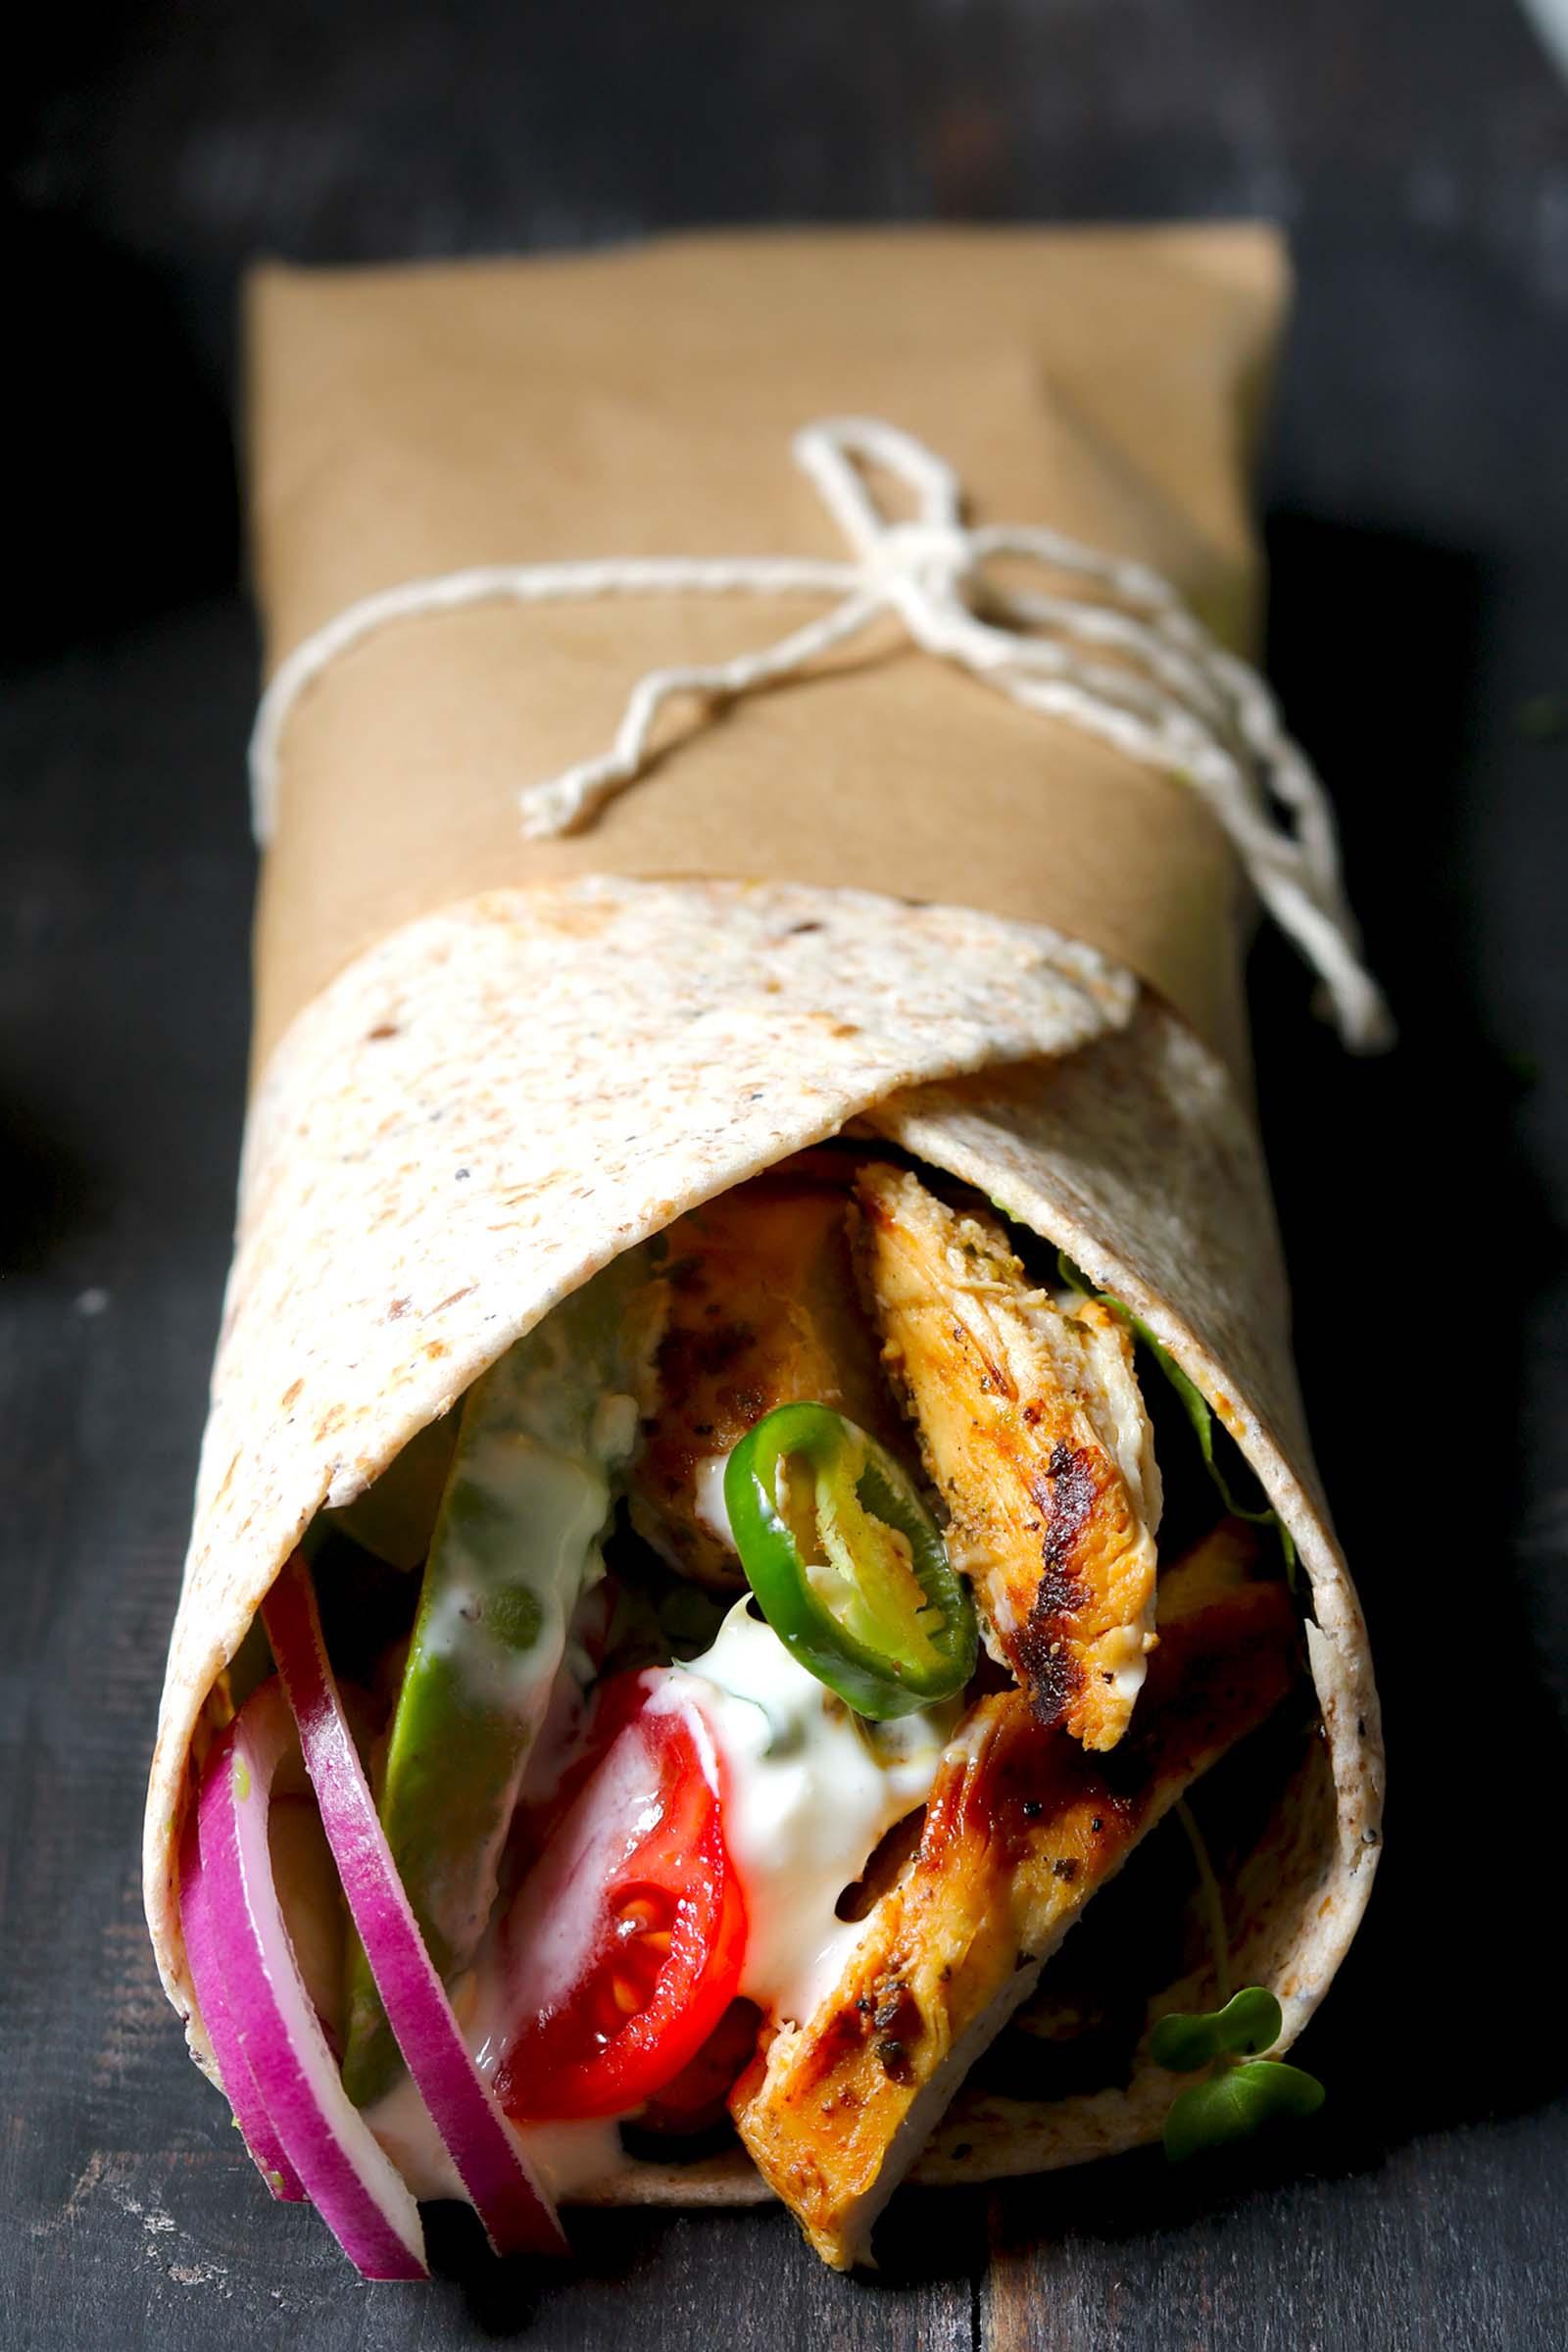 Chicken Wrap - thelastfoodblog.com